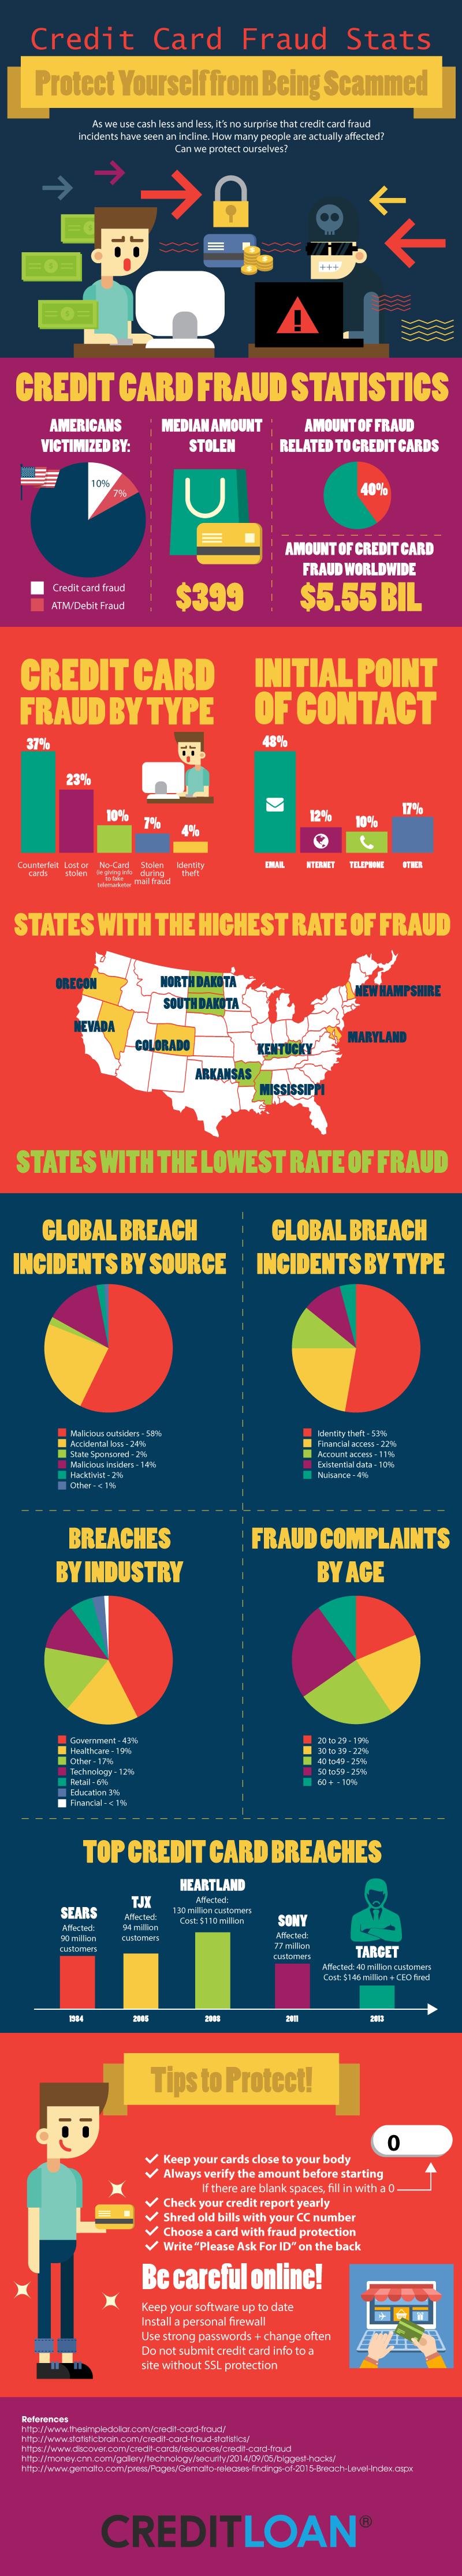 credit card fraud stats